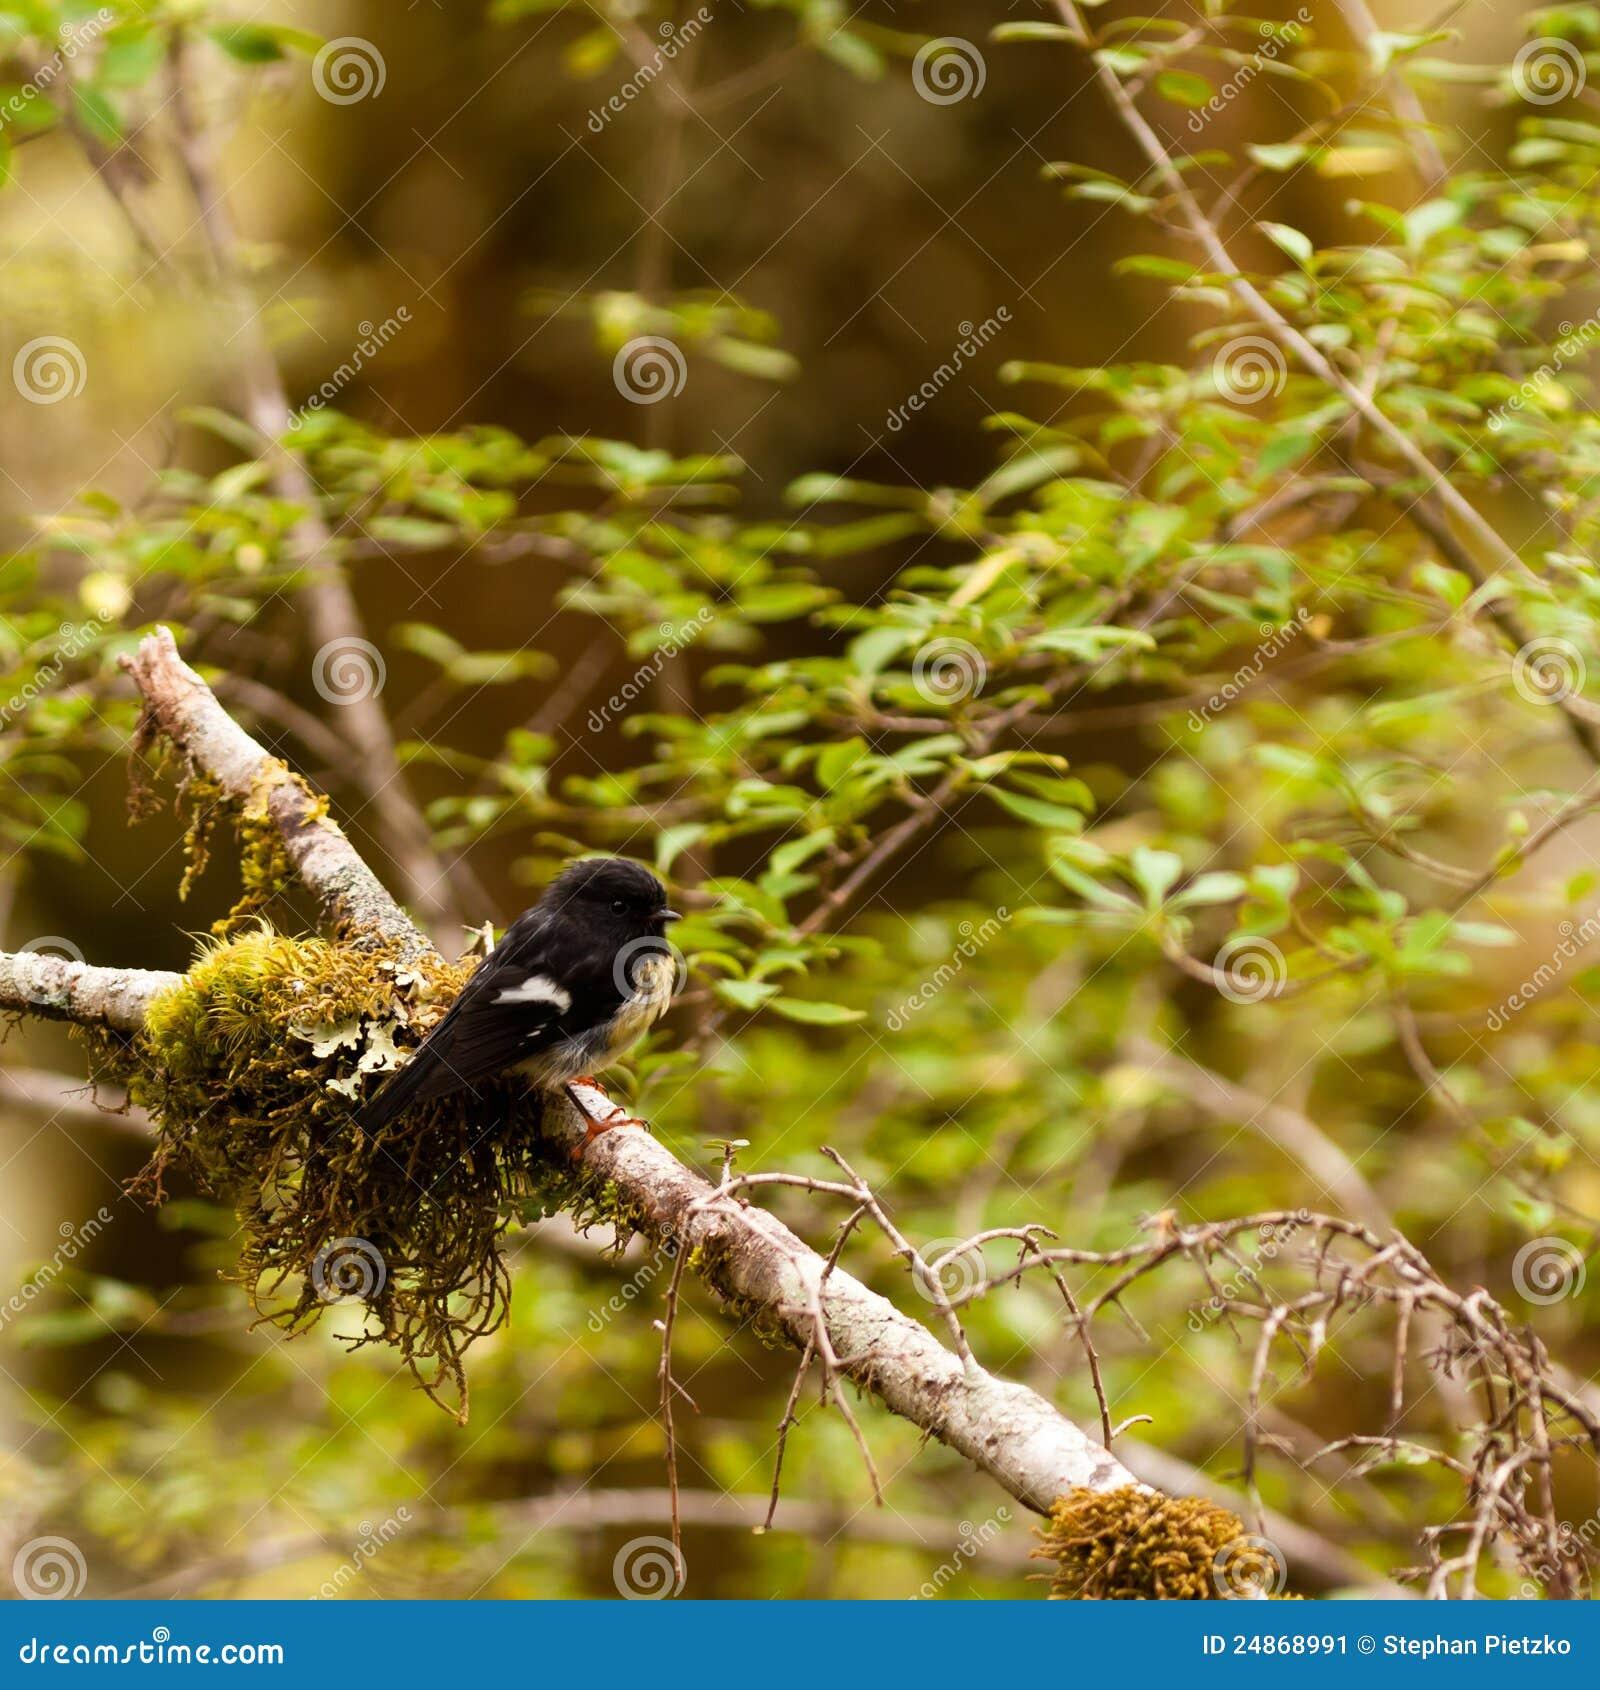 Endemic NZ bird Tomtit, Petroica macrocephala